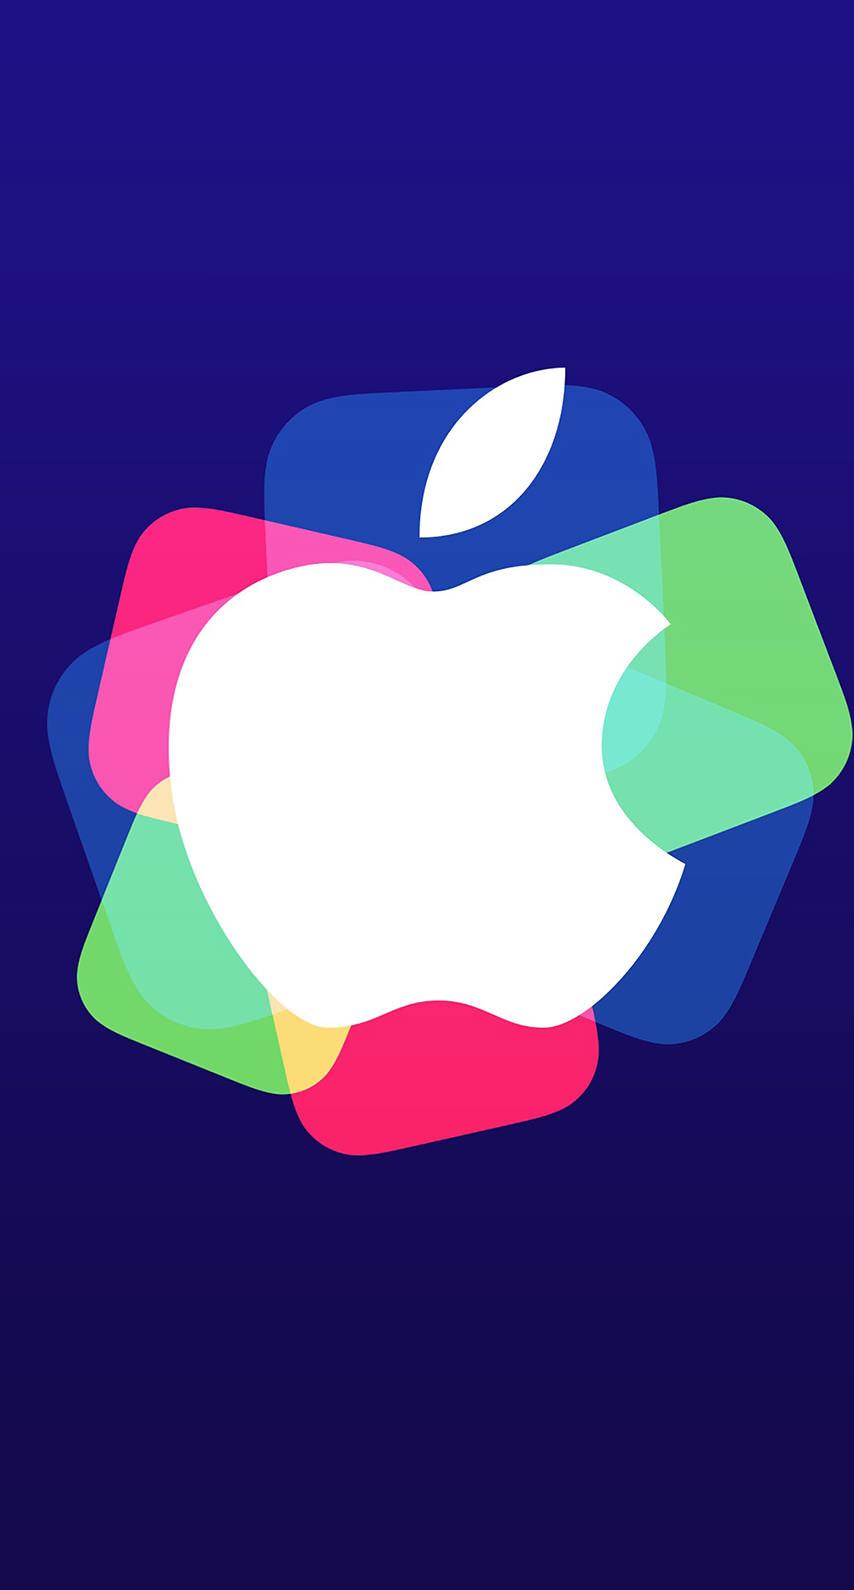 Apple Logo Event Purple Colorful Wallpaper Sc Iphone8